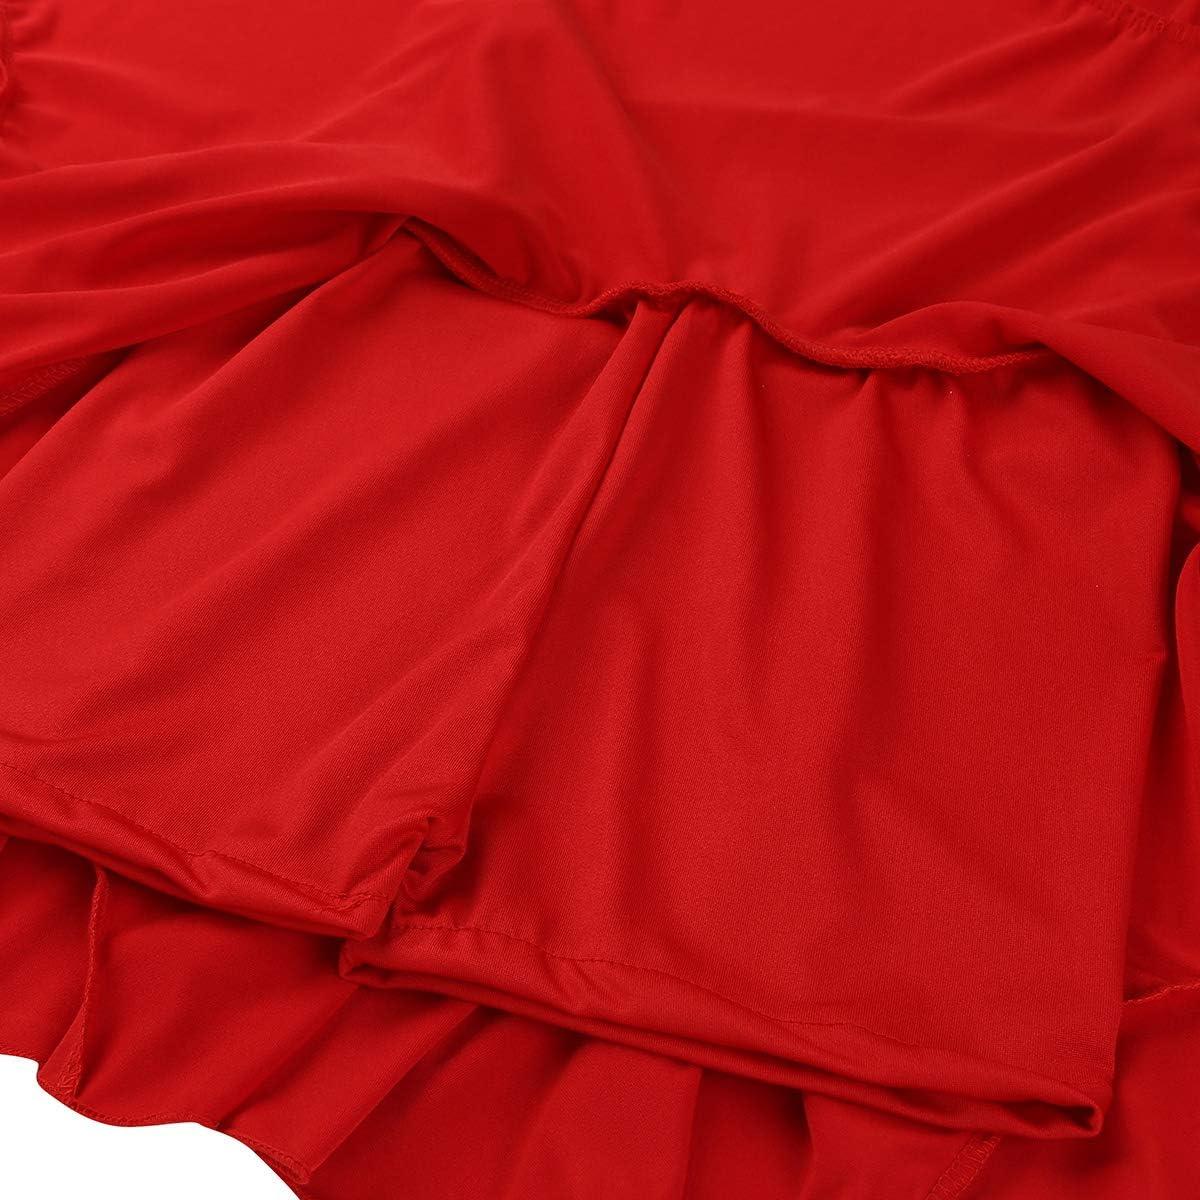 ranrann Falda de Baile Latino para Mujer Falda Corta de Danza Tango Rumba con Volantes Cintura Alta Vestido de Danza Moderna Culottes Dancewear